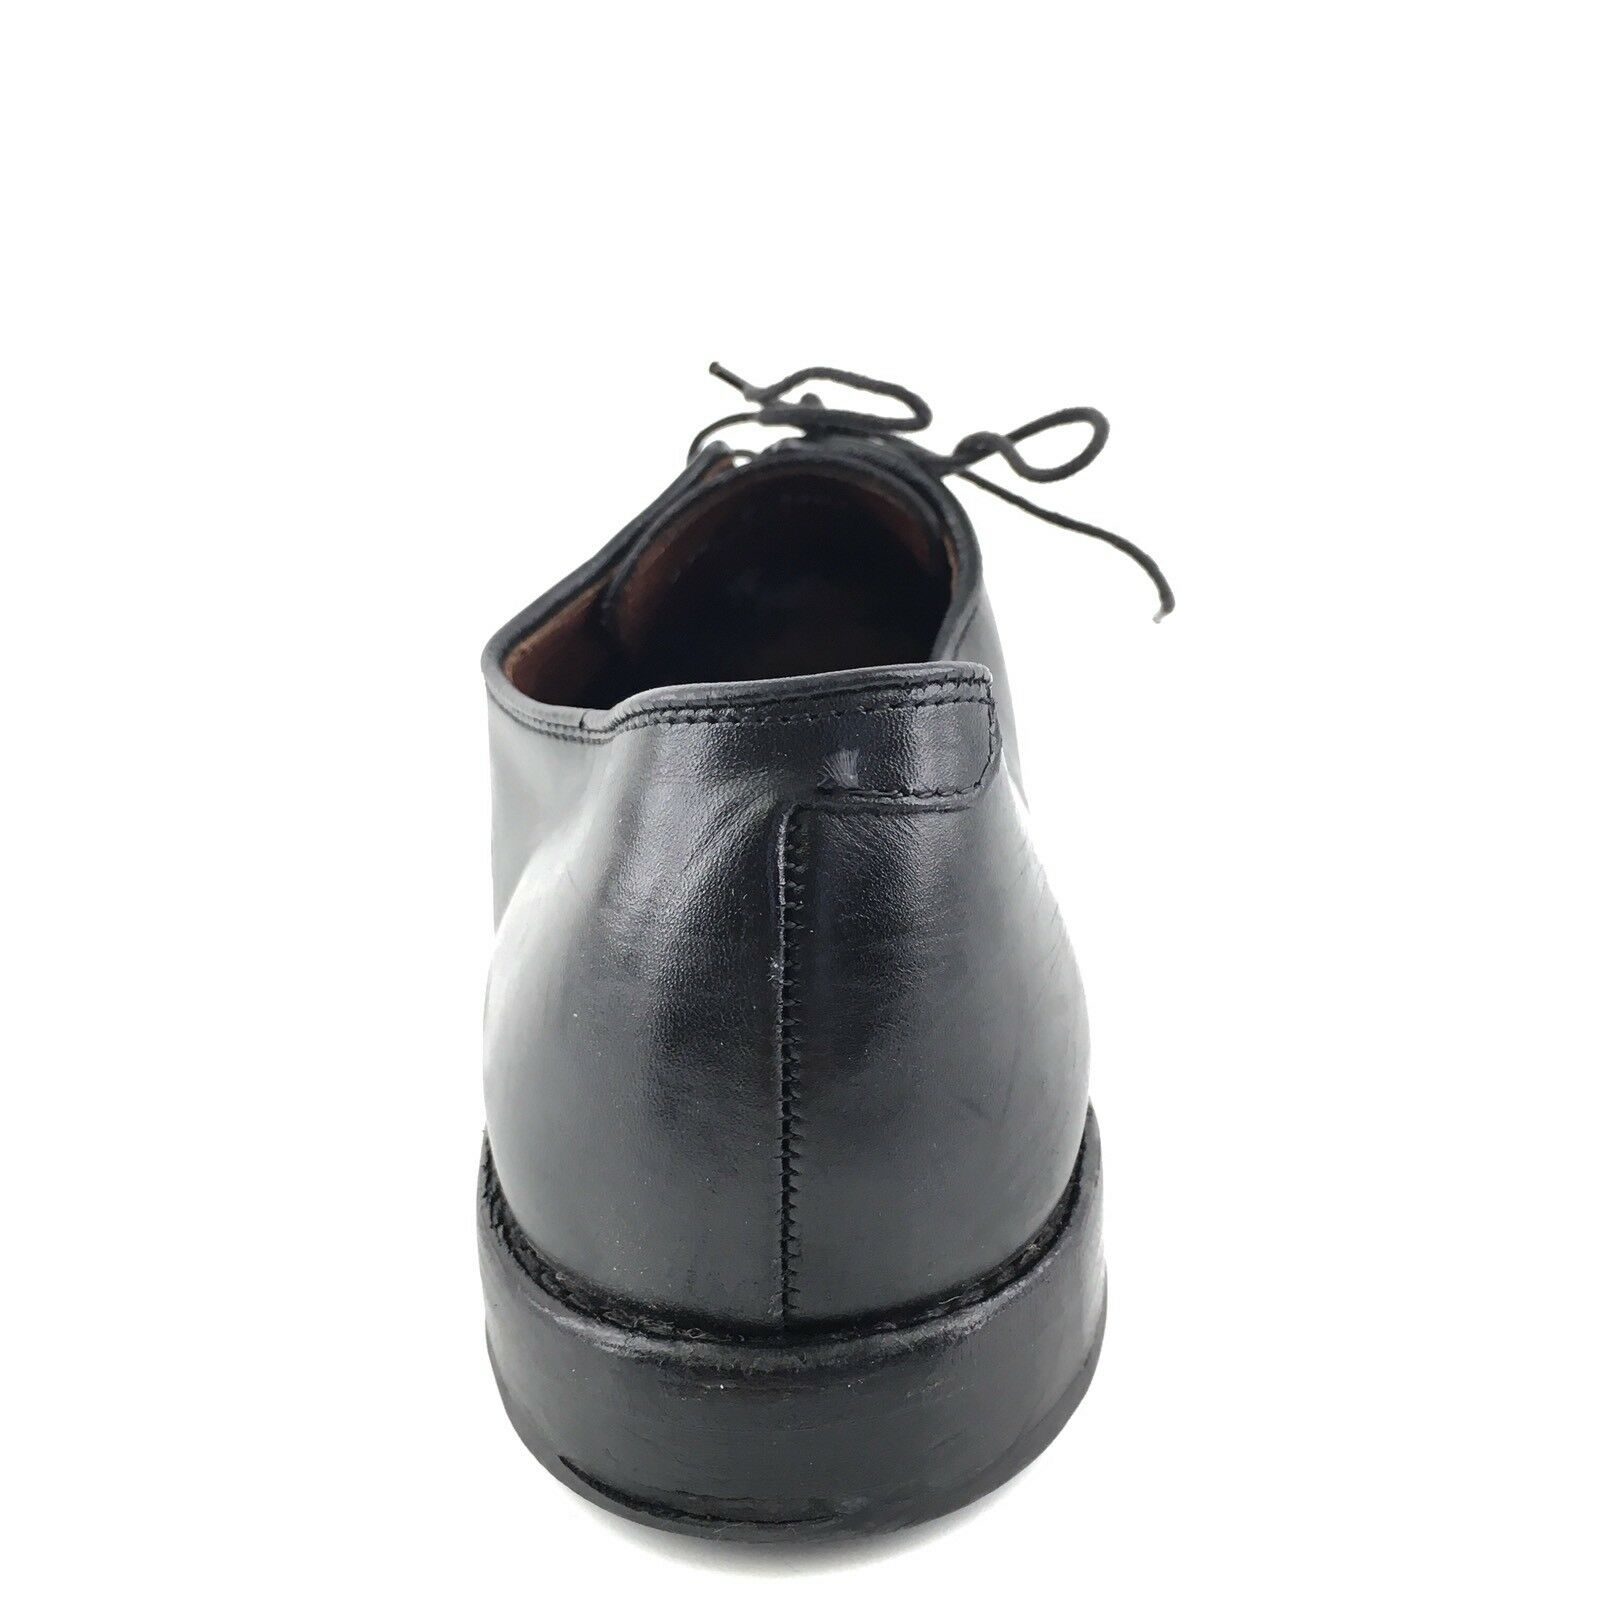 Allen hombre Edmonds Clifton Negro Cuero captoe Oxfords Zapatos de hombre Allen M d9f0fc